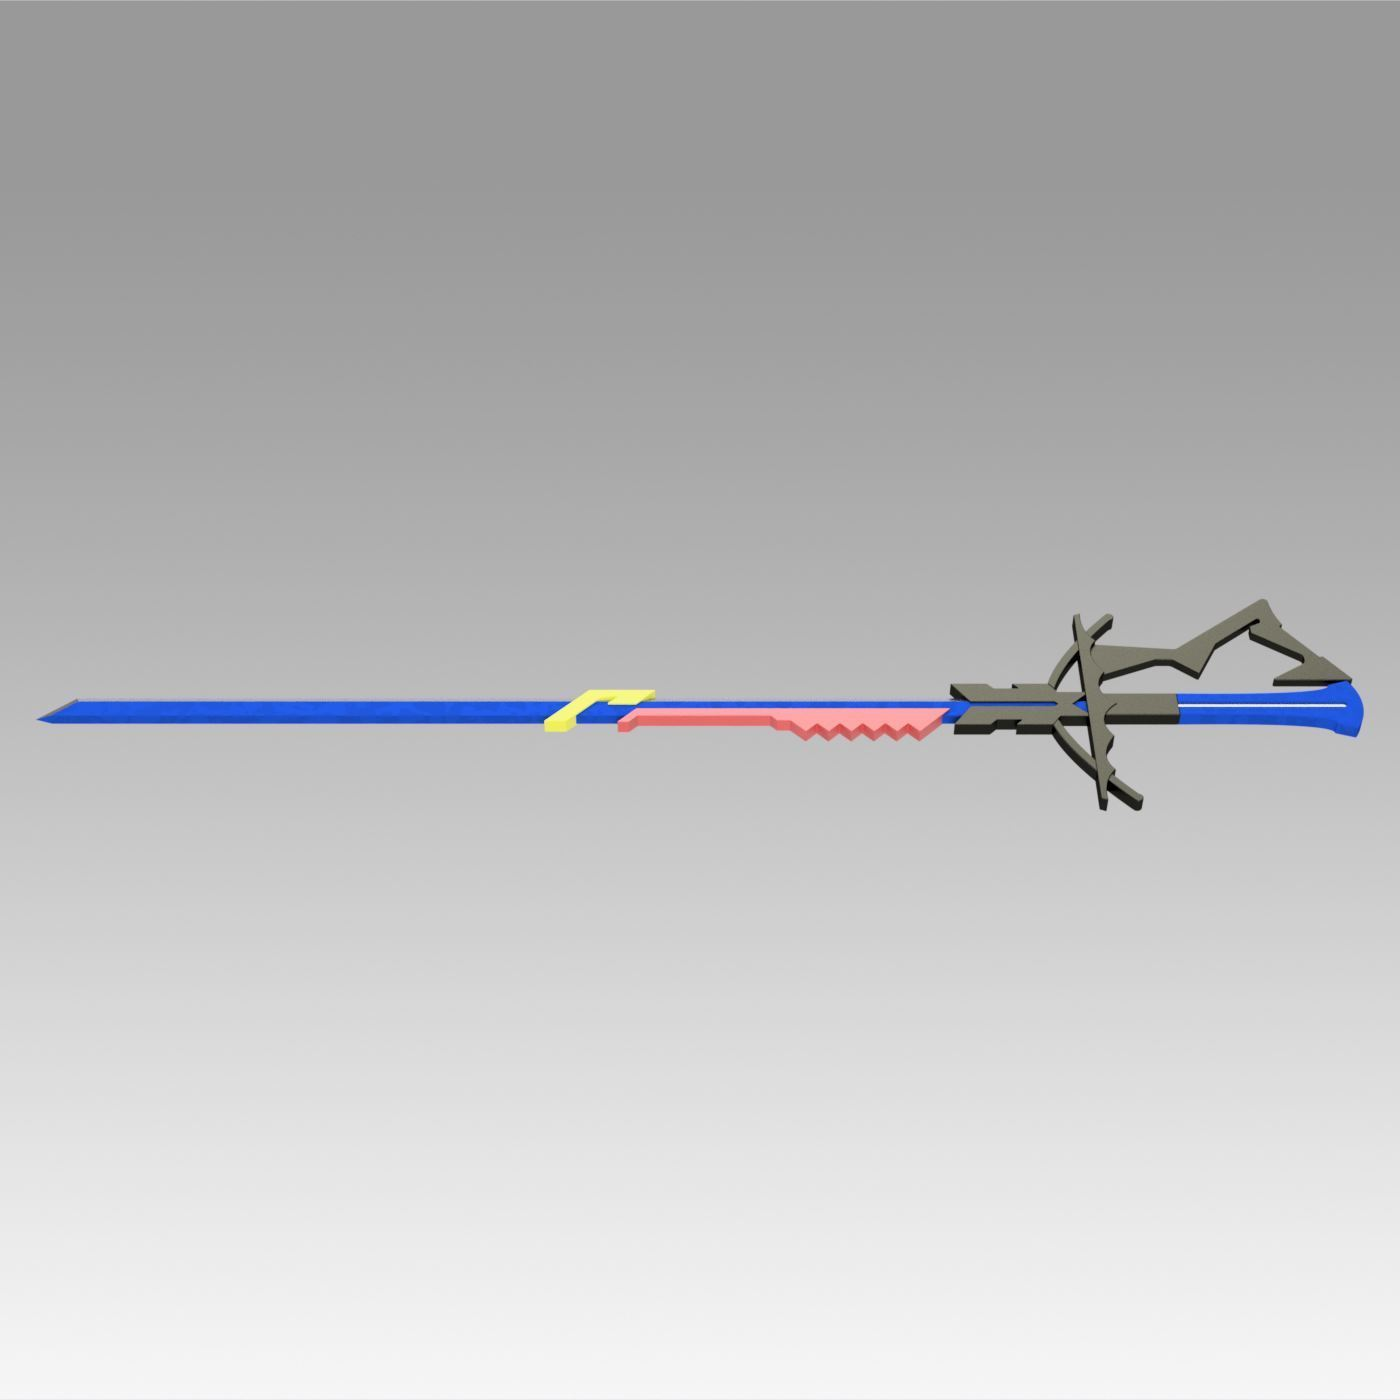 7.jpg Download OBJ file Arknights Astesia Epoque Sword Cosplay Weapon Prop  • 3D printable template, Blackeveryday